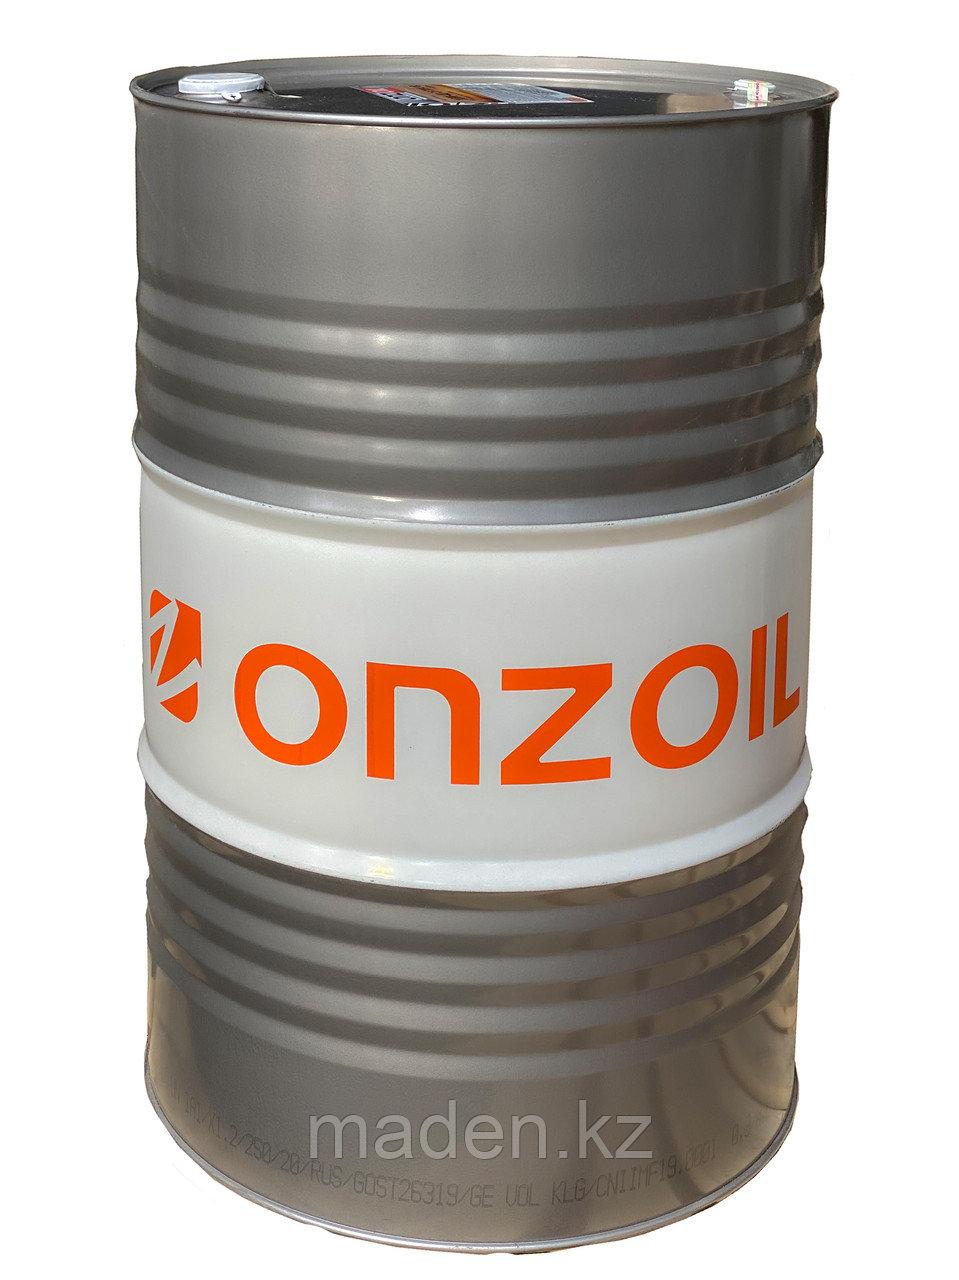 Моторное масло ONZOIL 10W40 Fleet Premium CI-4/SL 205.0